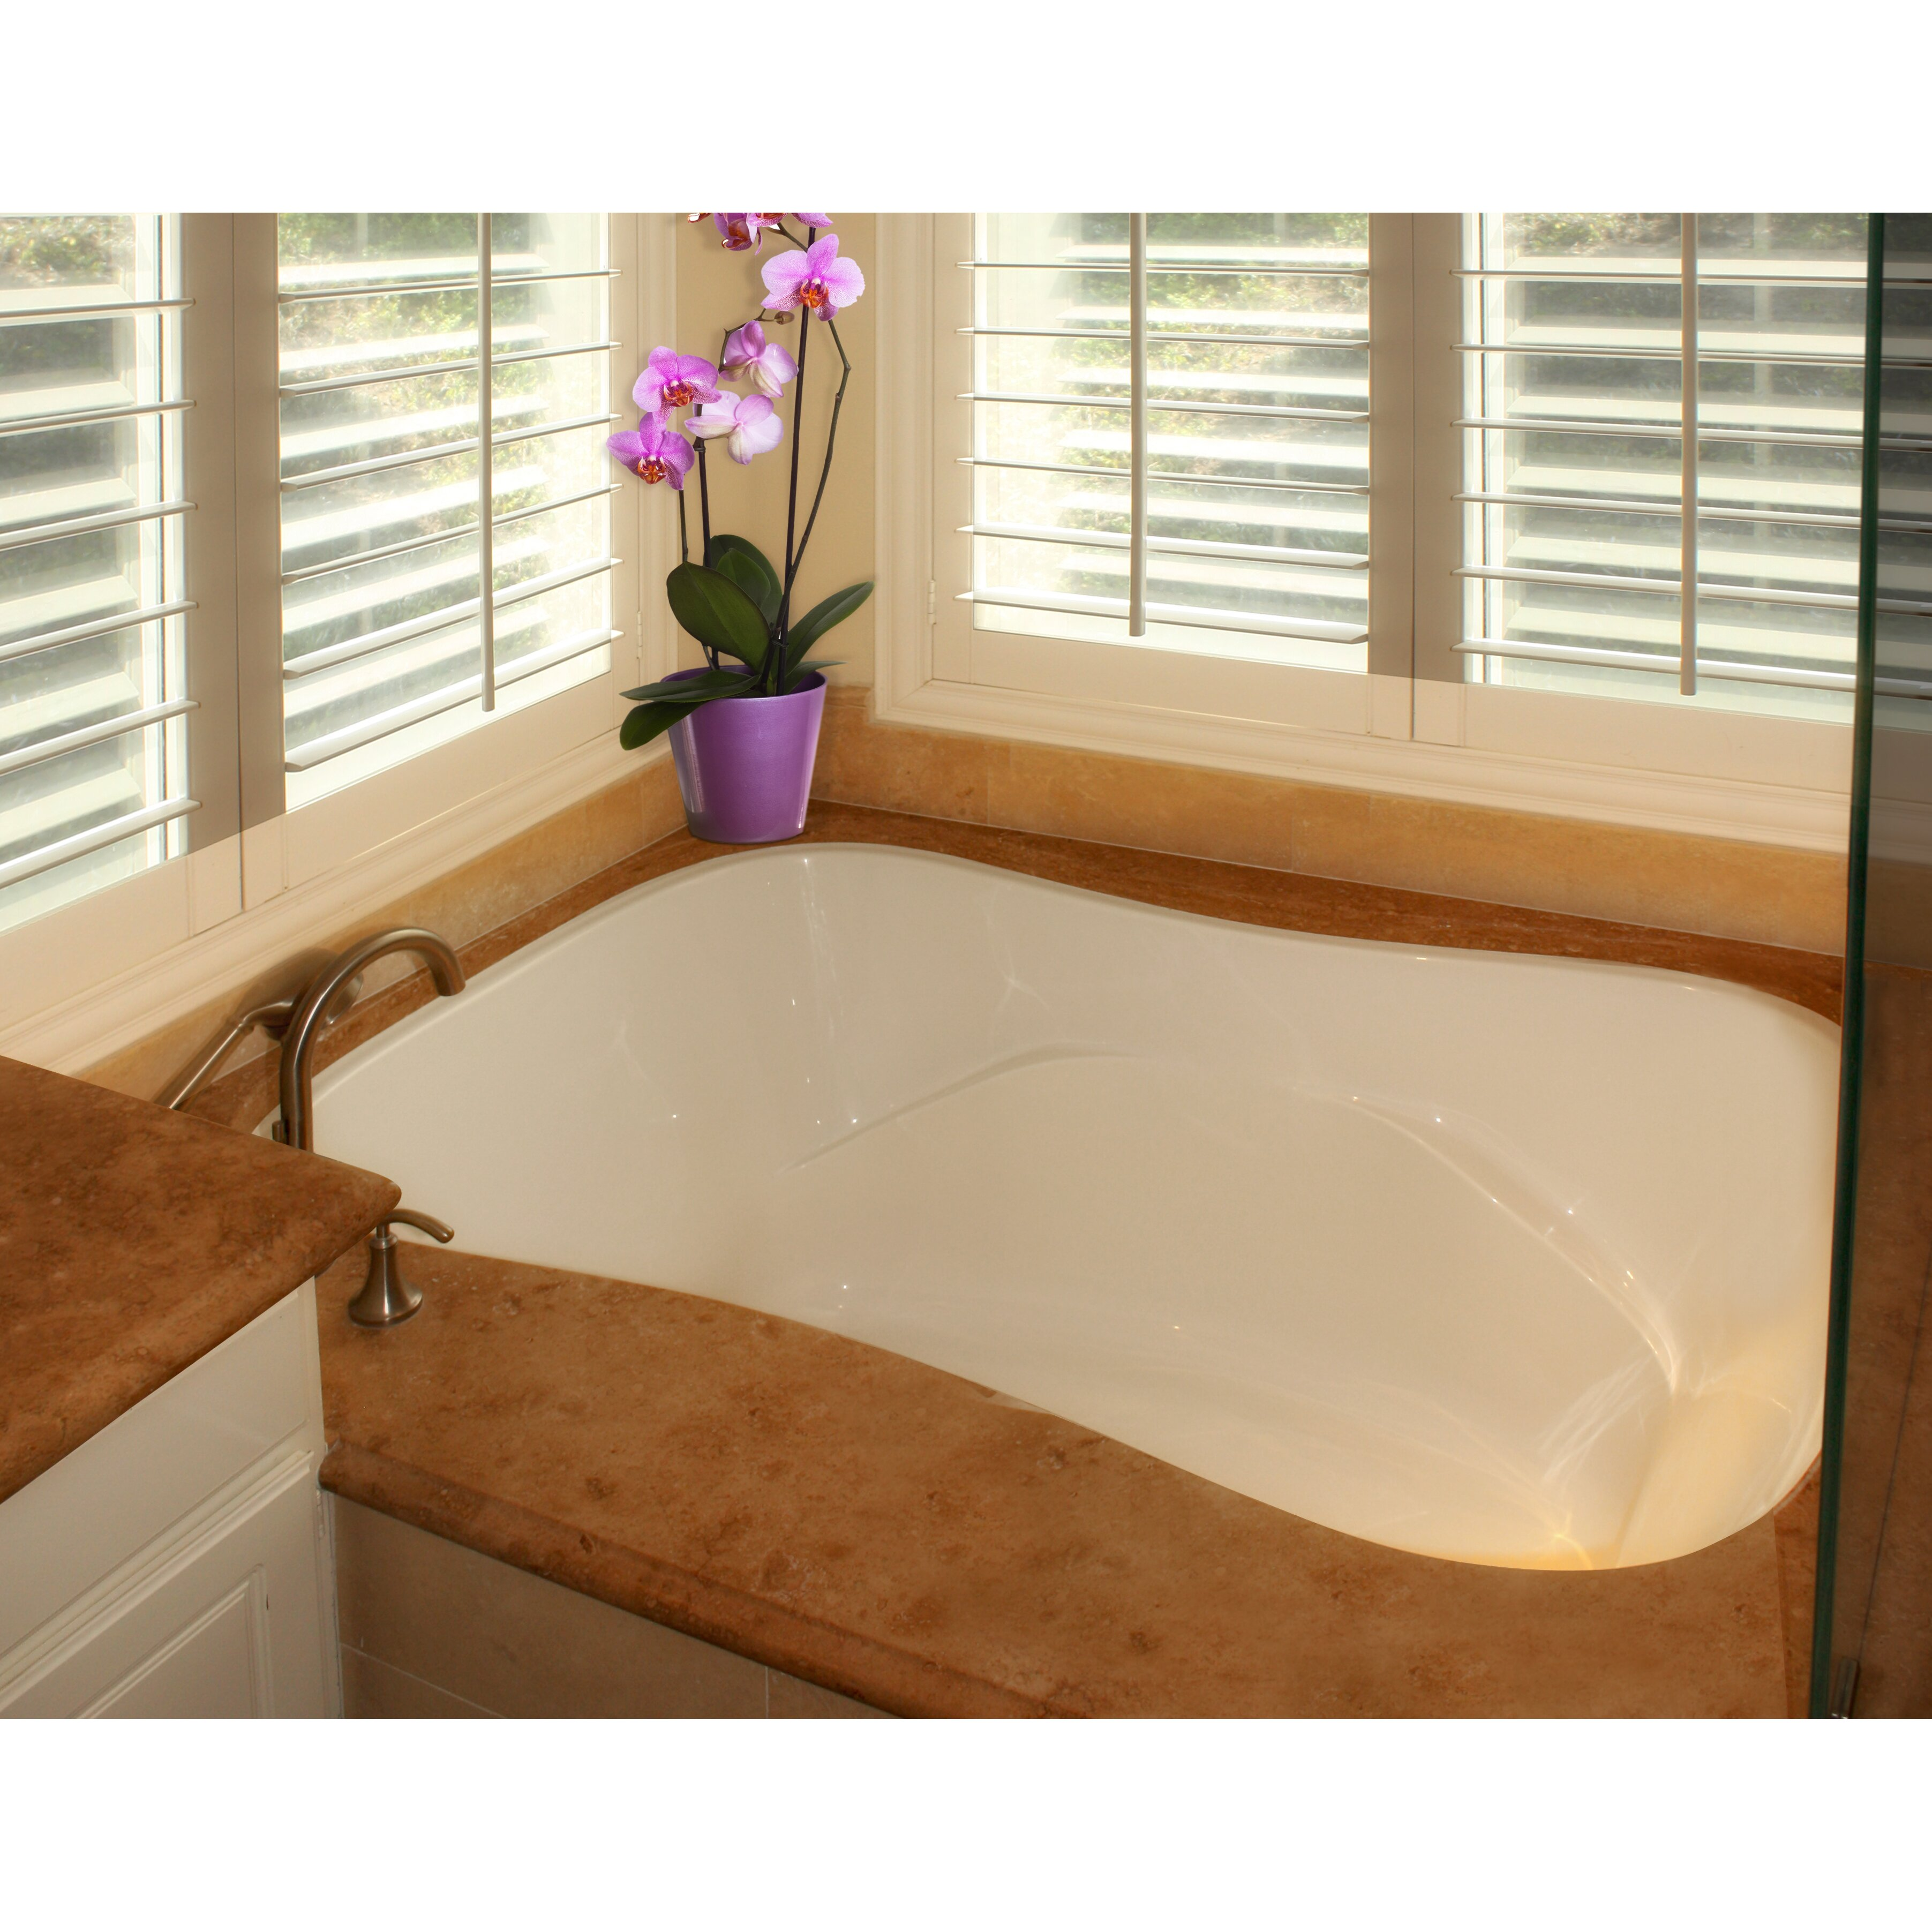 60 X 42 Bathtub 28 Images 60 X 42 Alcove Bathtub Bathubs Home Design Ideas Reliance